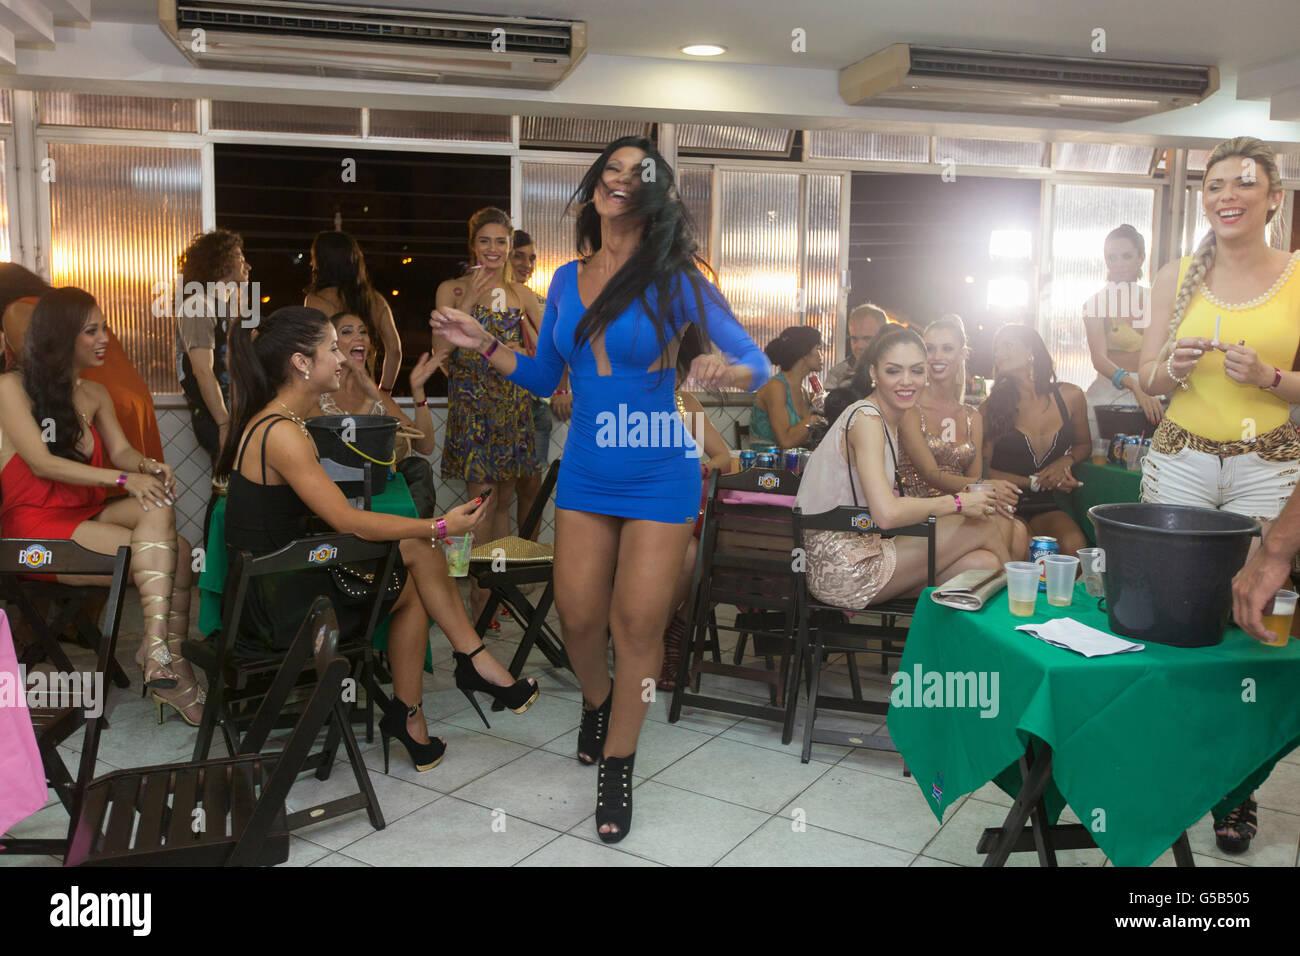 Girls In Night Club In Rio De Janeiro Brazil